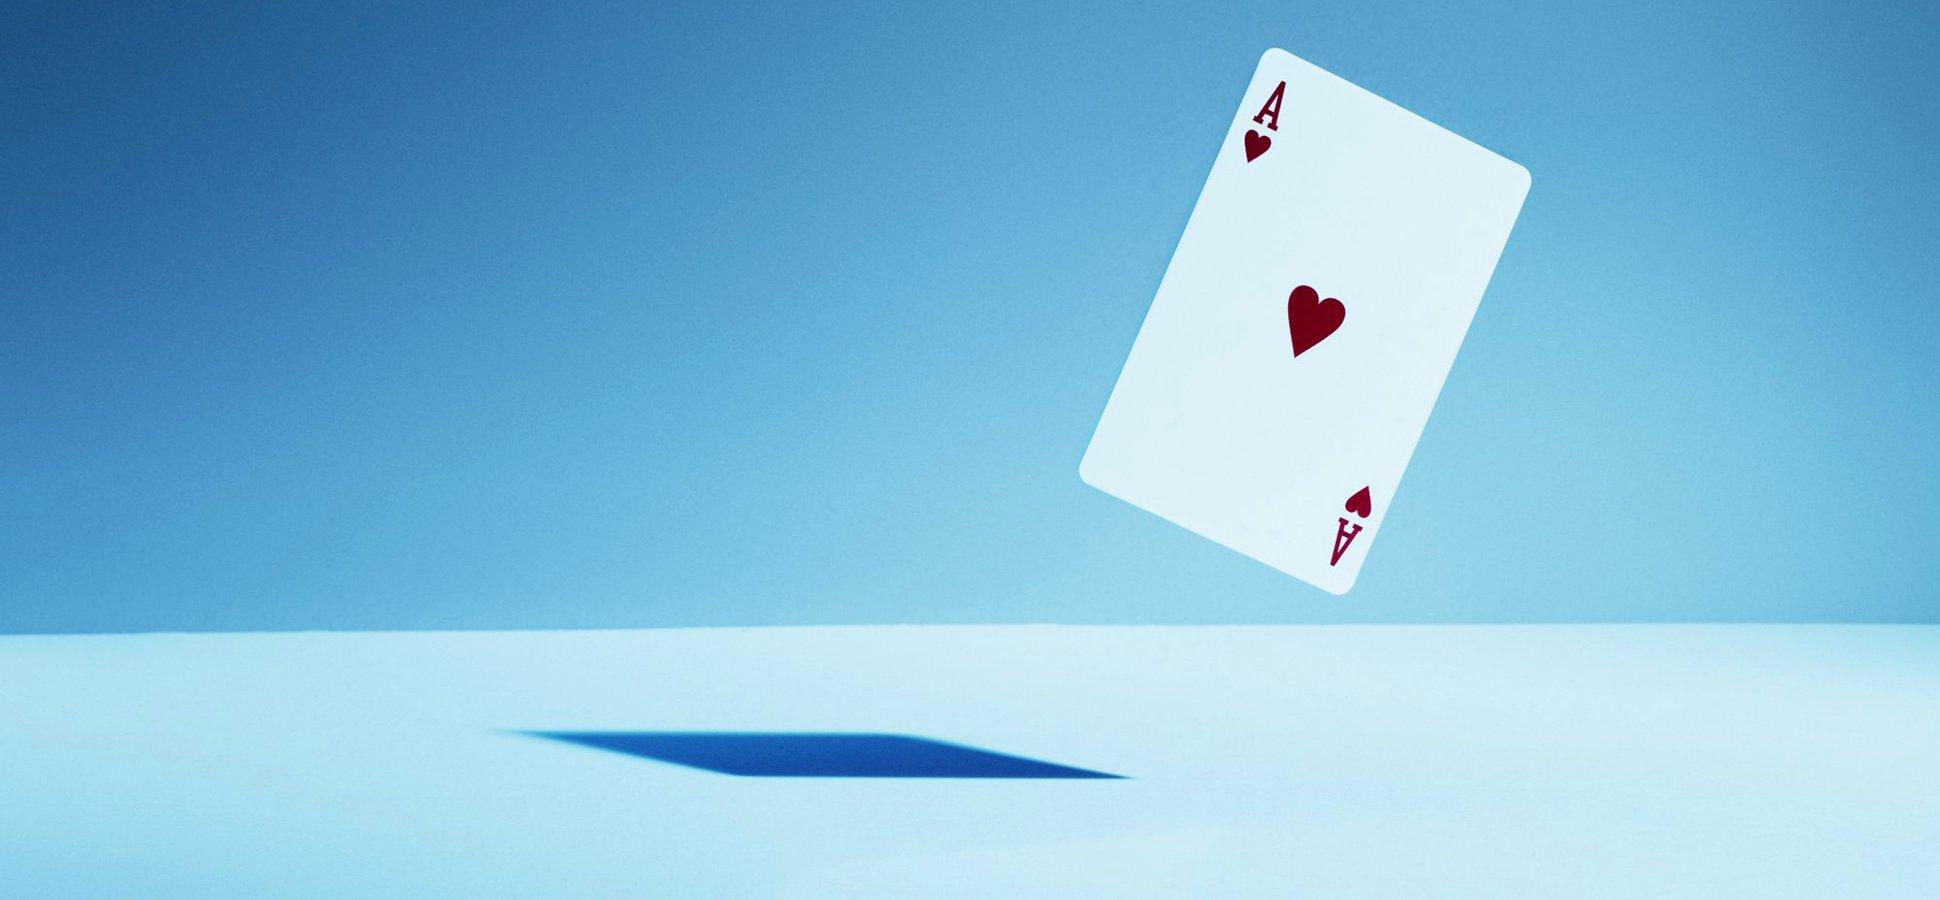 Online gamble software online gambling usa